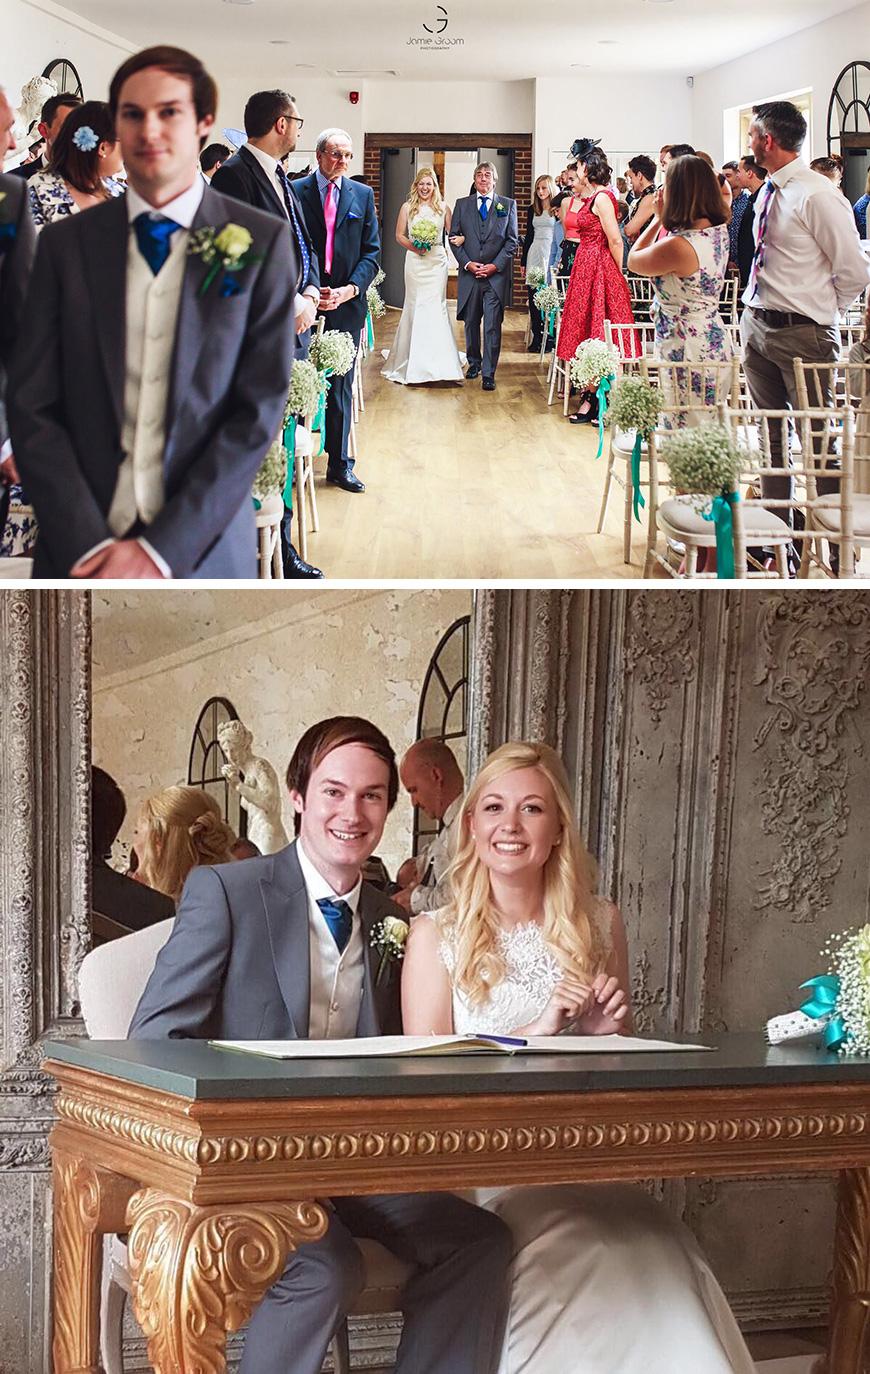 Real Wedding - Lucy and Ryan's Elegant Summer Wedding at Oxnead Hall | CHWV